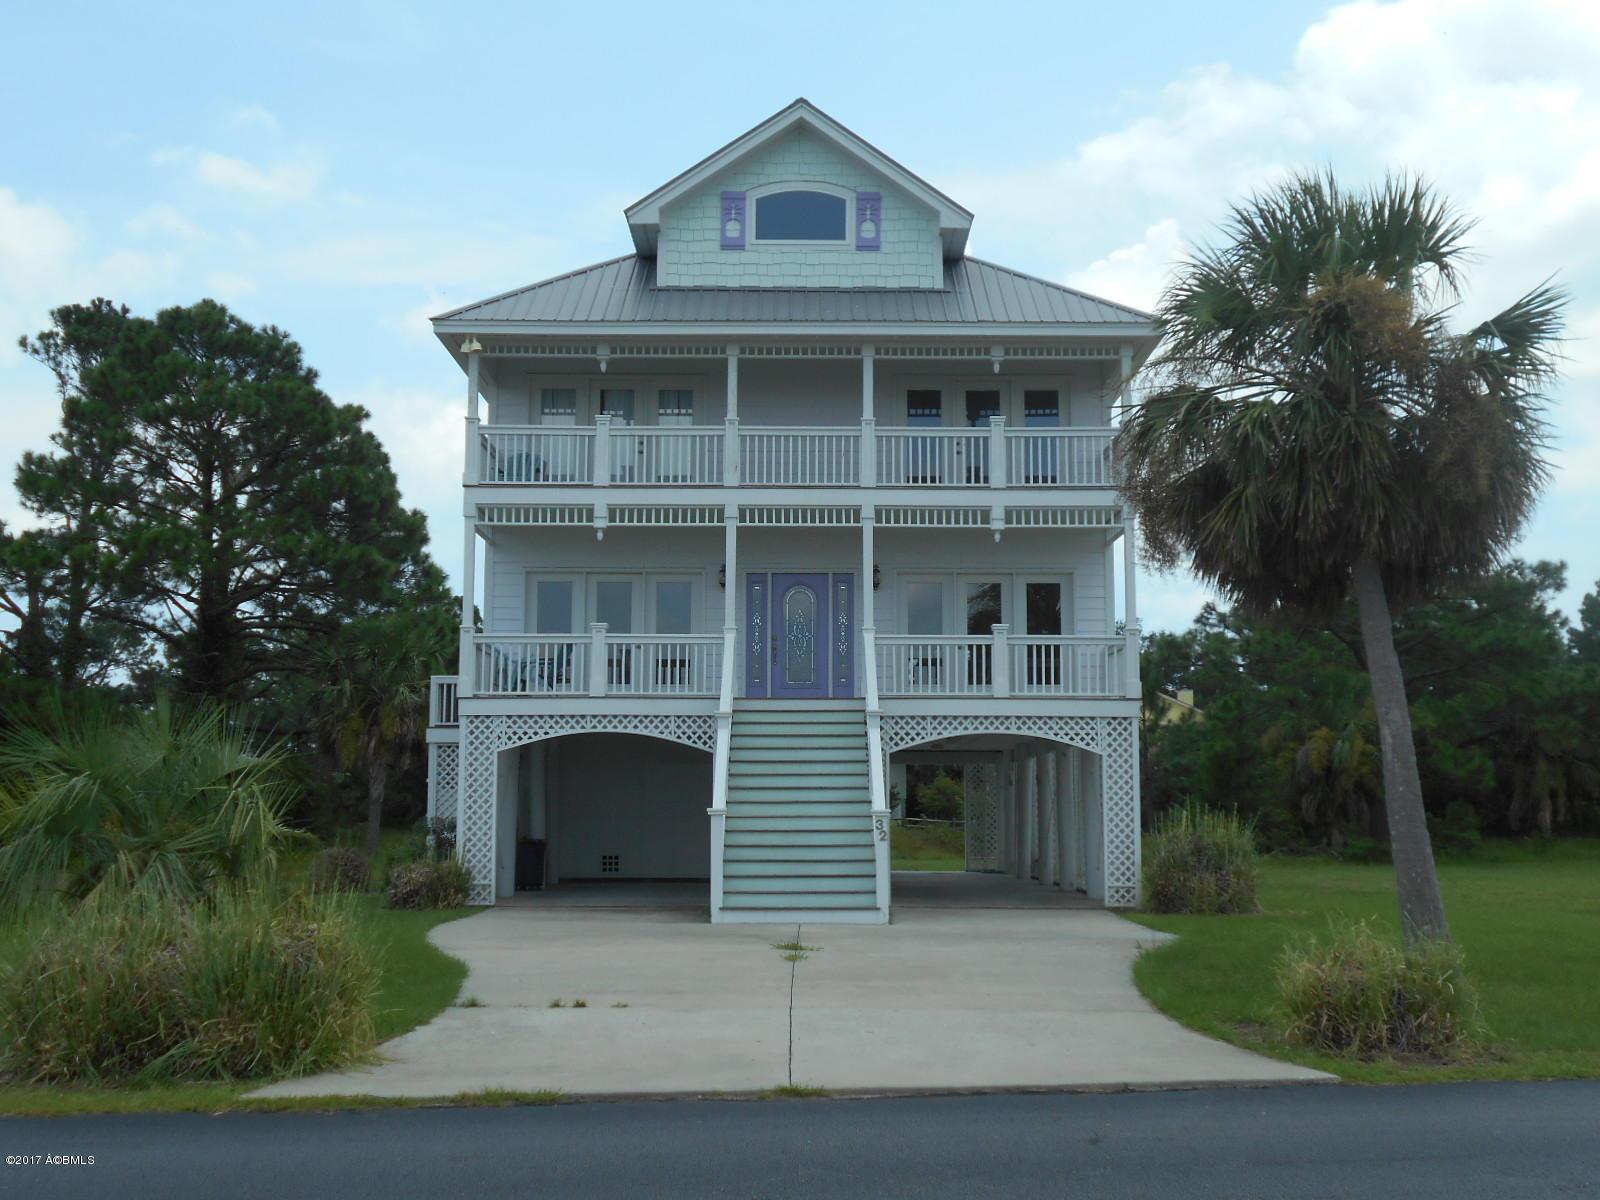 Photo of 32 Harbor Drive, Harbor Island, SC 29920